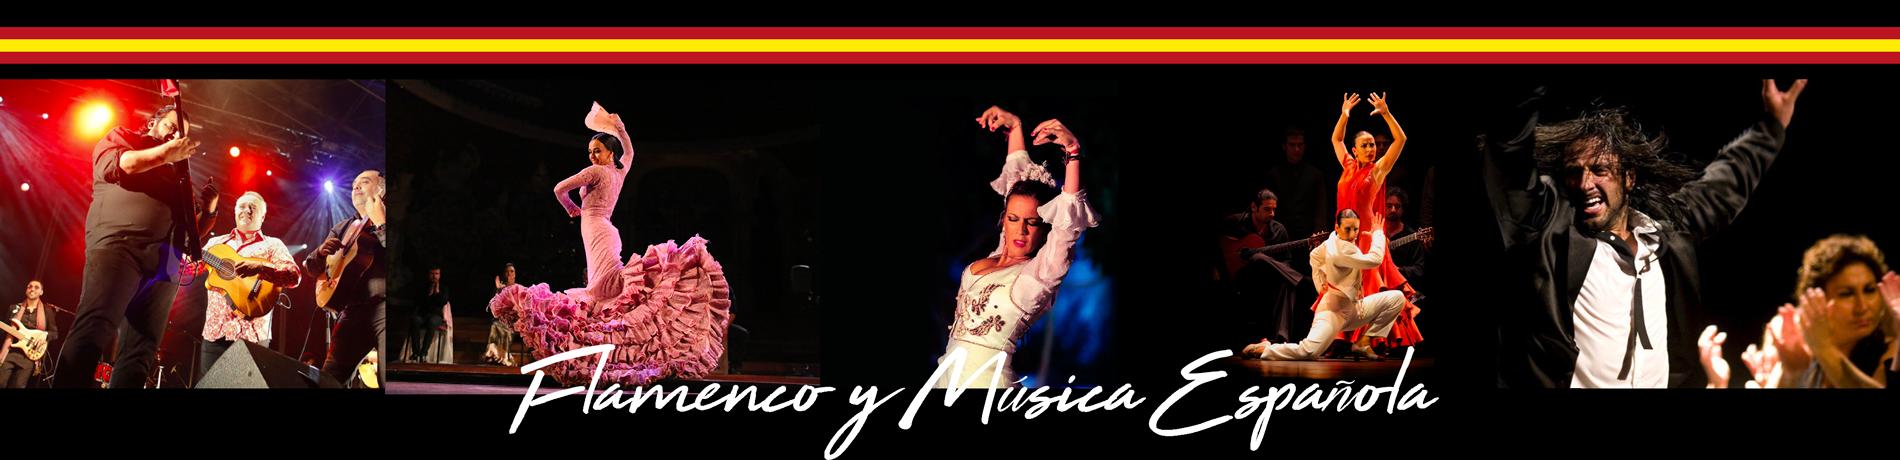 Flamenco y Música Española